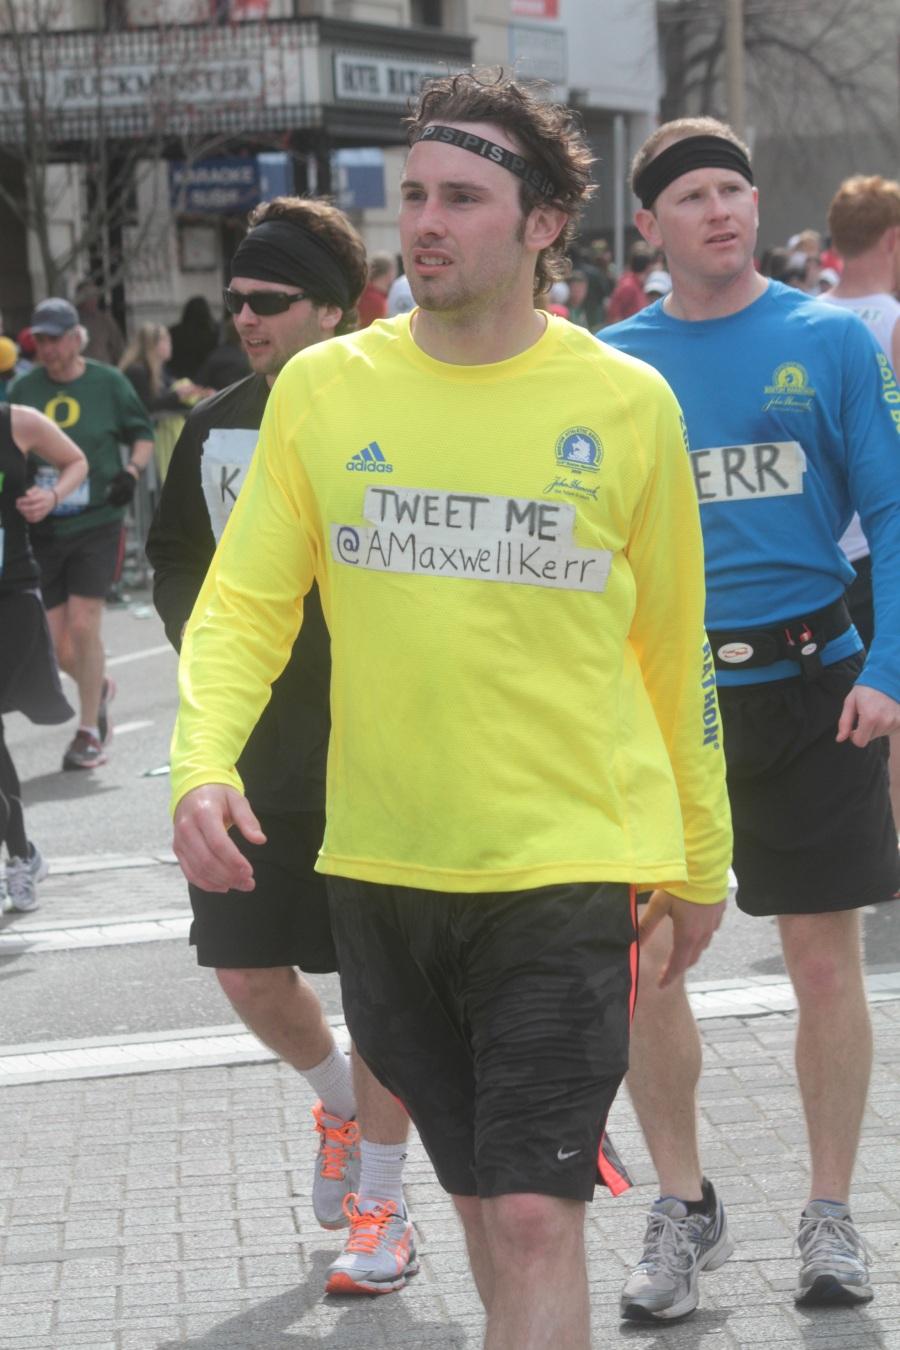 boston marathon 2013 tweet me maxwell kerr